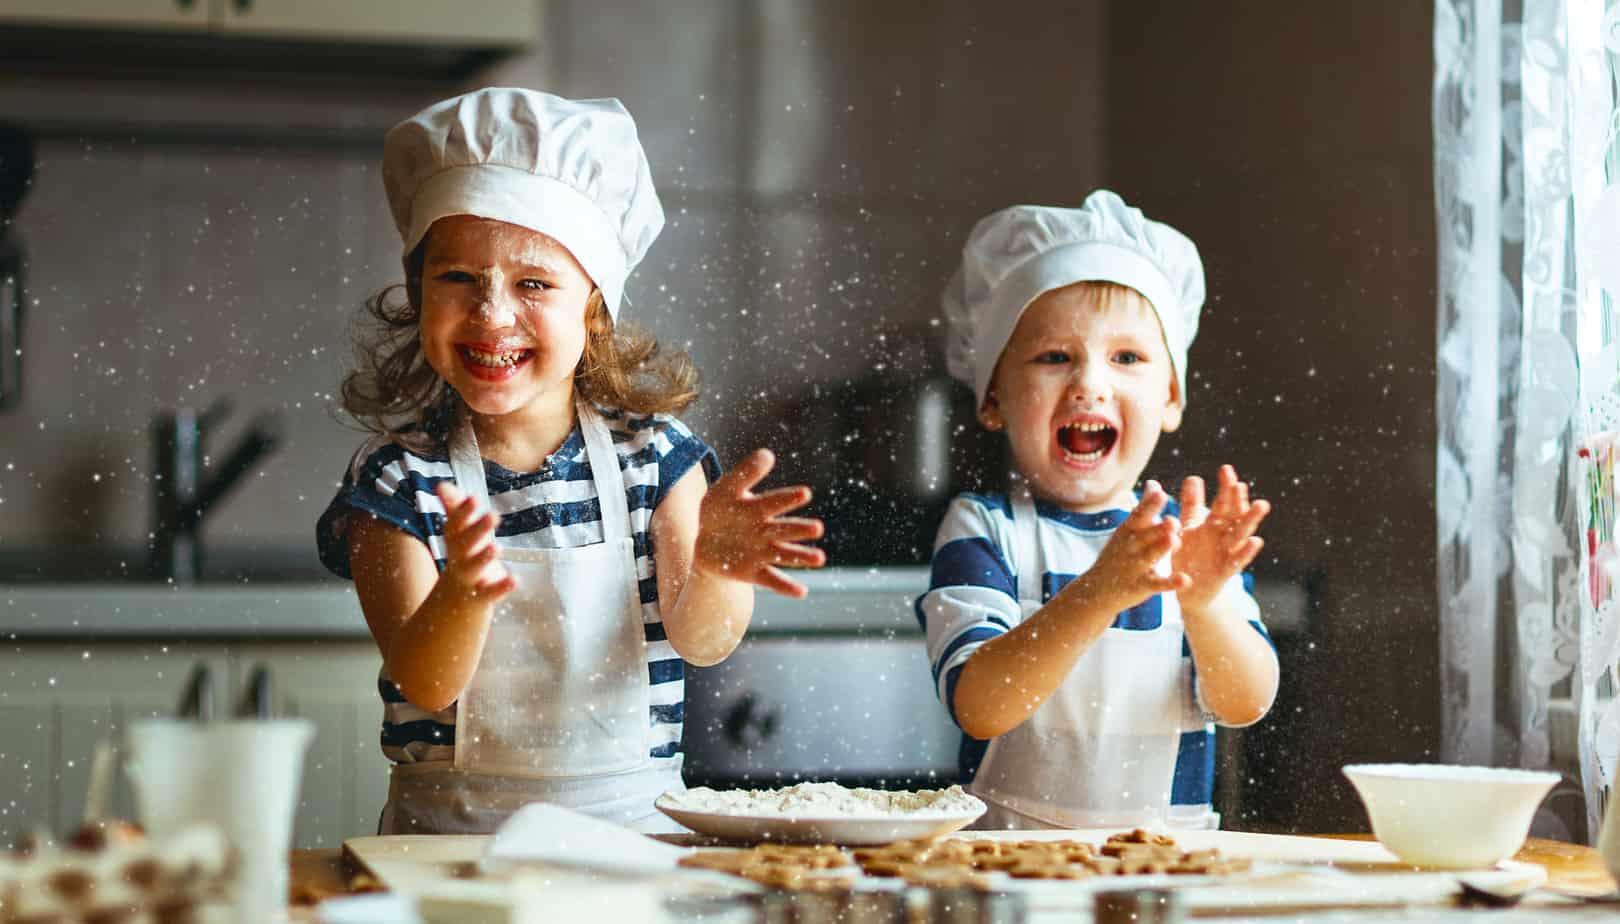 How to Keep the Kids Amused on Rainy Days